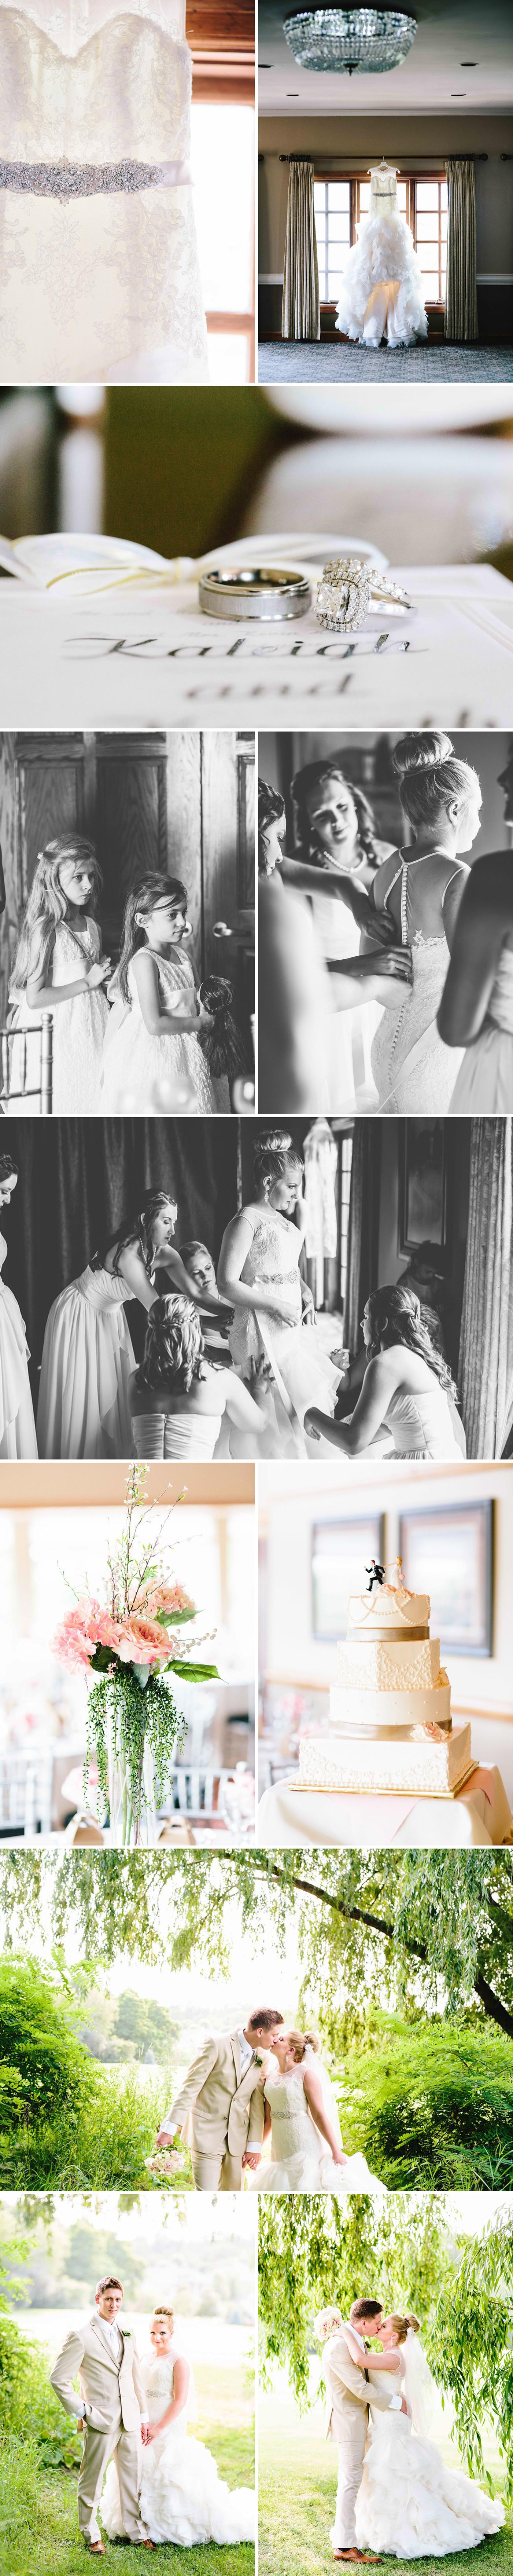 chicago-fine-art-wedding-photography-horney